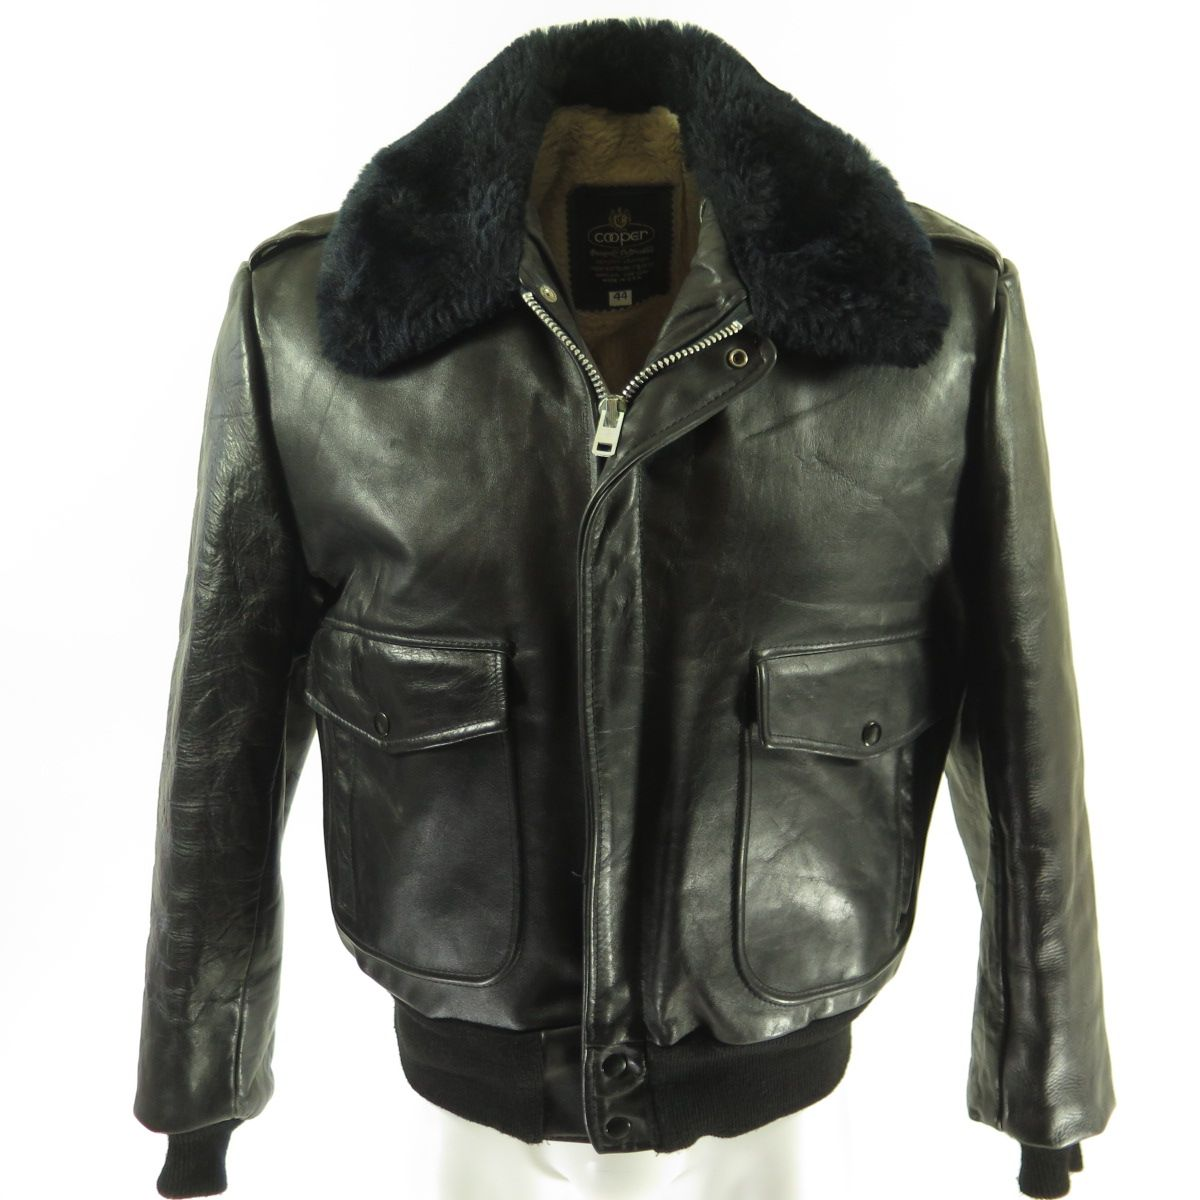 Vintage 60s Bomber Leather Jacket Mens 44 Flight Cooper Fleece Black Ideal The Clothing Vault Leather Jacket Men Leather Bomber Jacket Jackets [ 1200 x 1200 Pixel ]